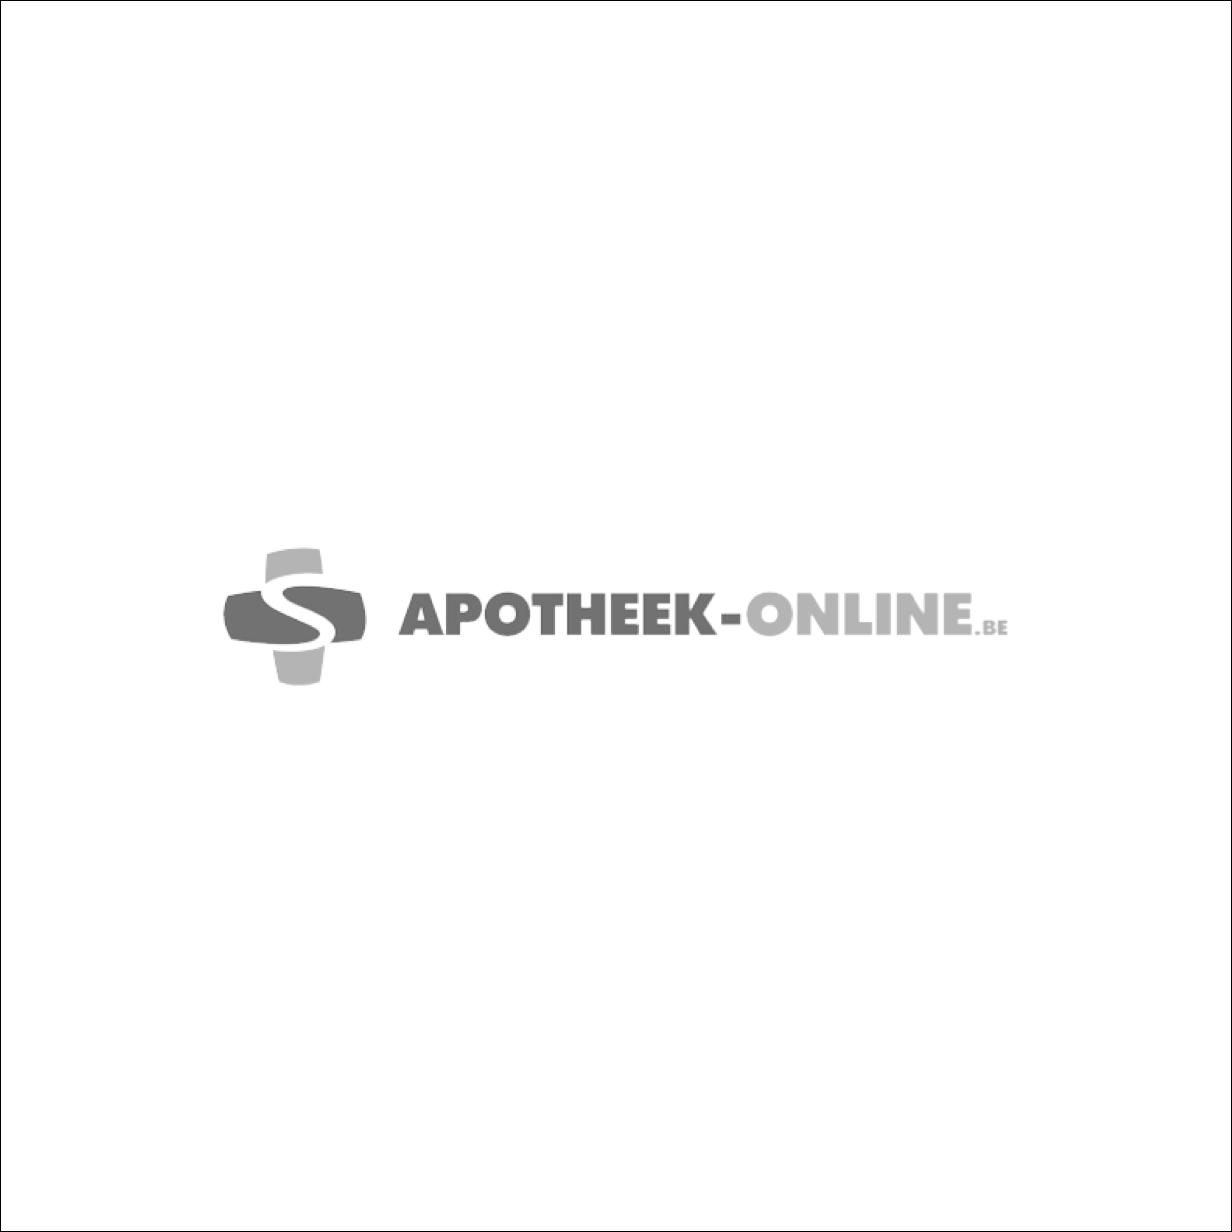 Idealast-haft Blauw 8cmx4m 1 P/s